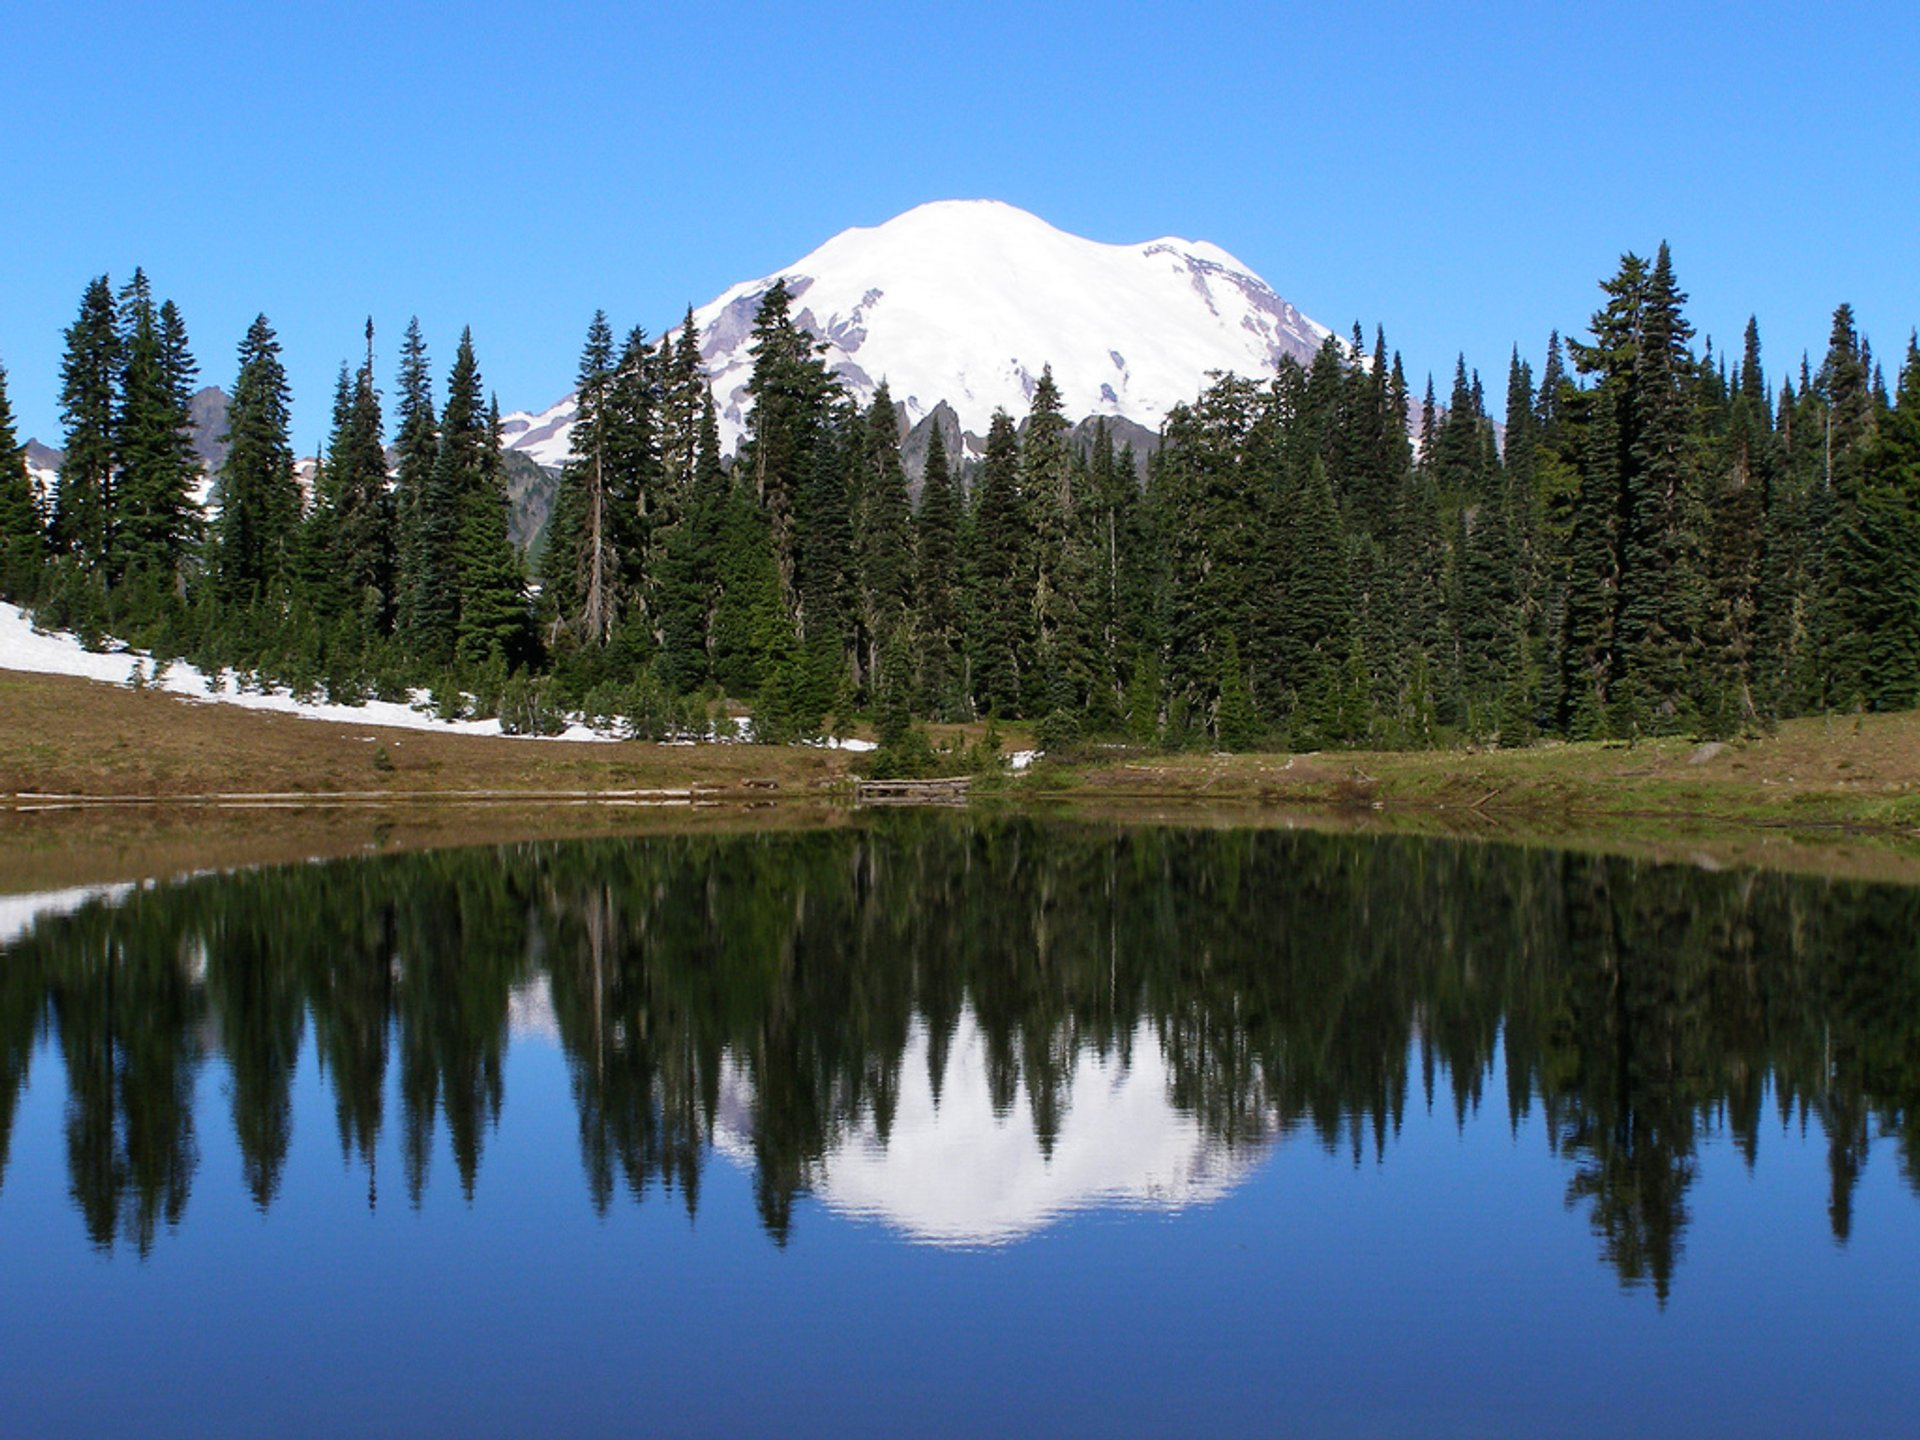 Mount Rainier reflected in Tipsoo Lake 2020